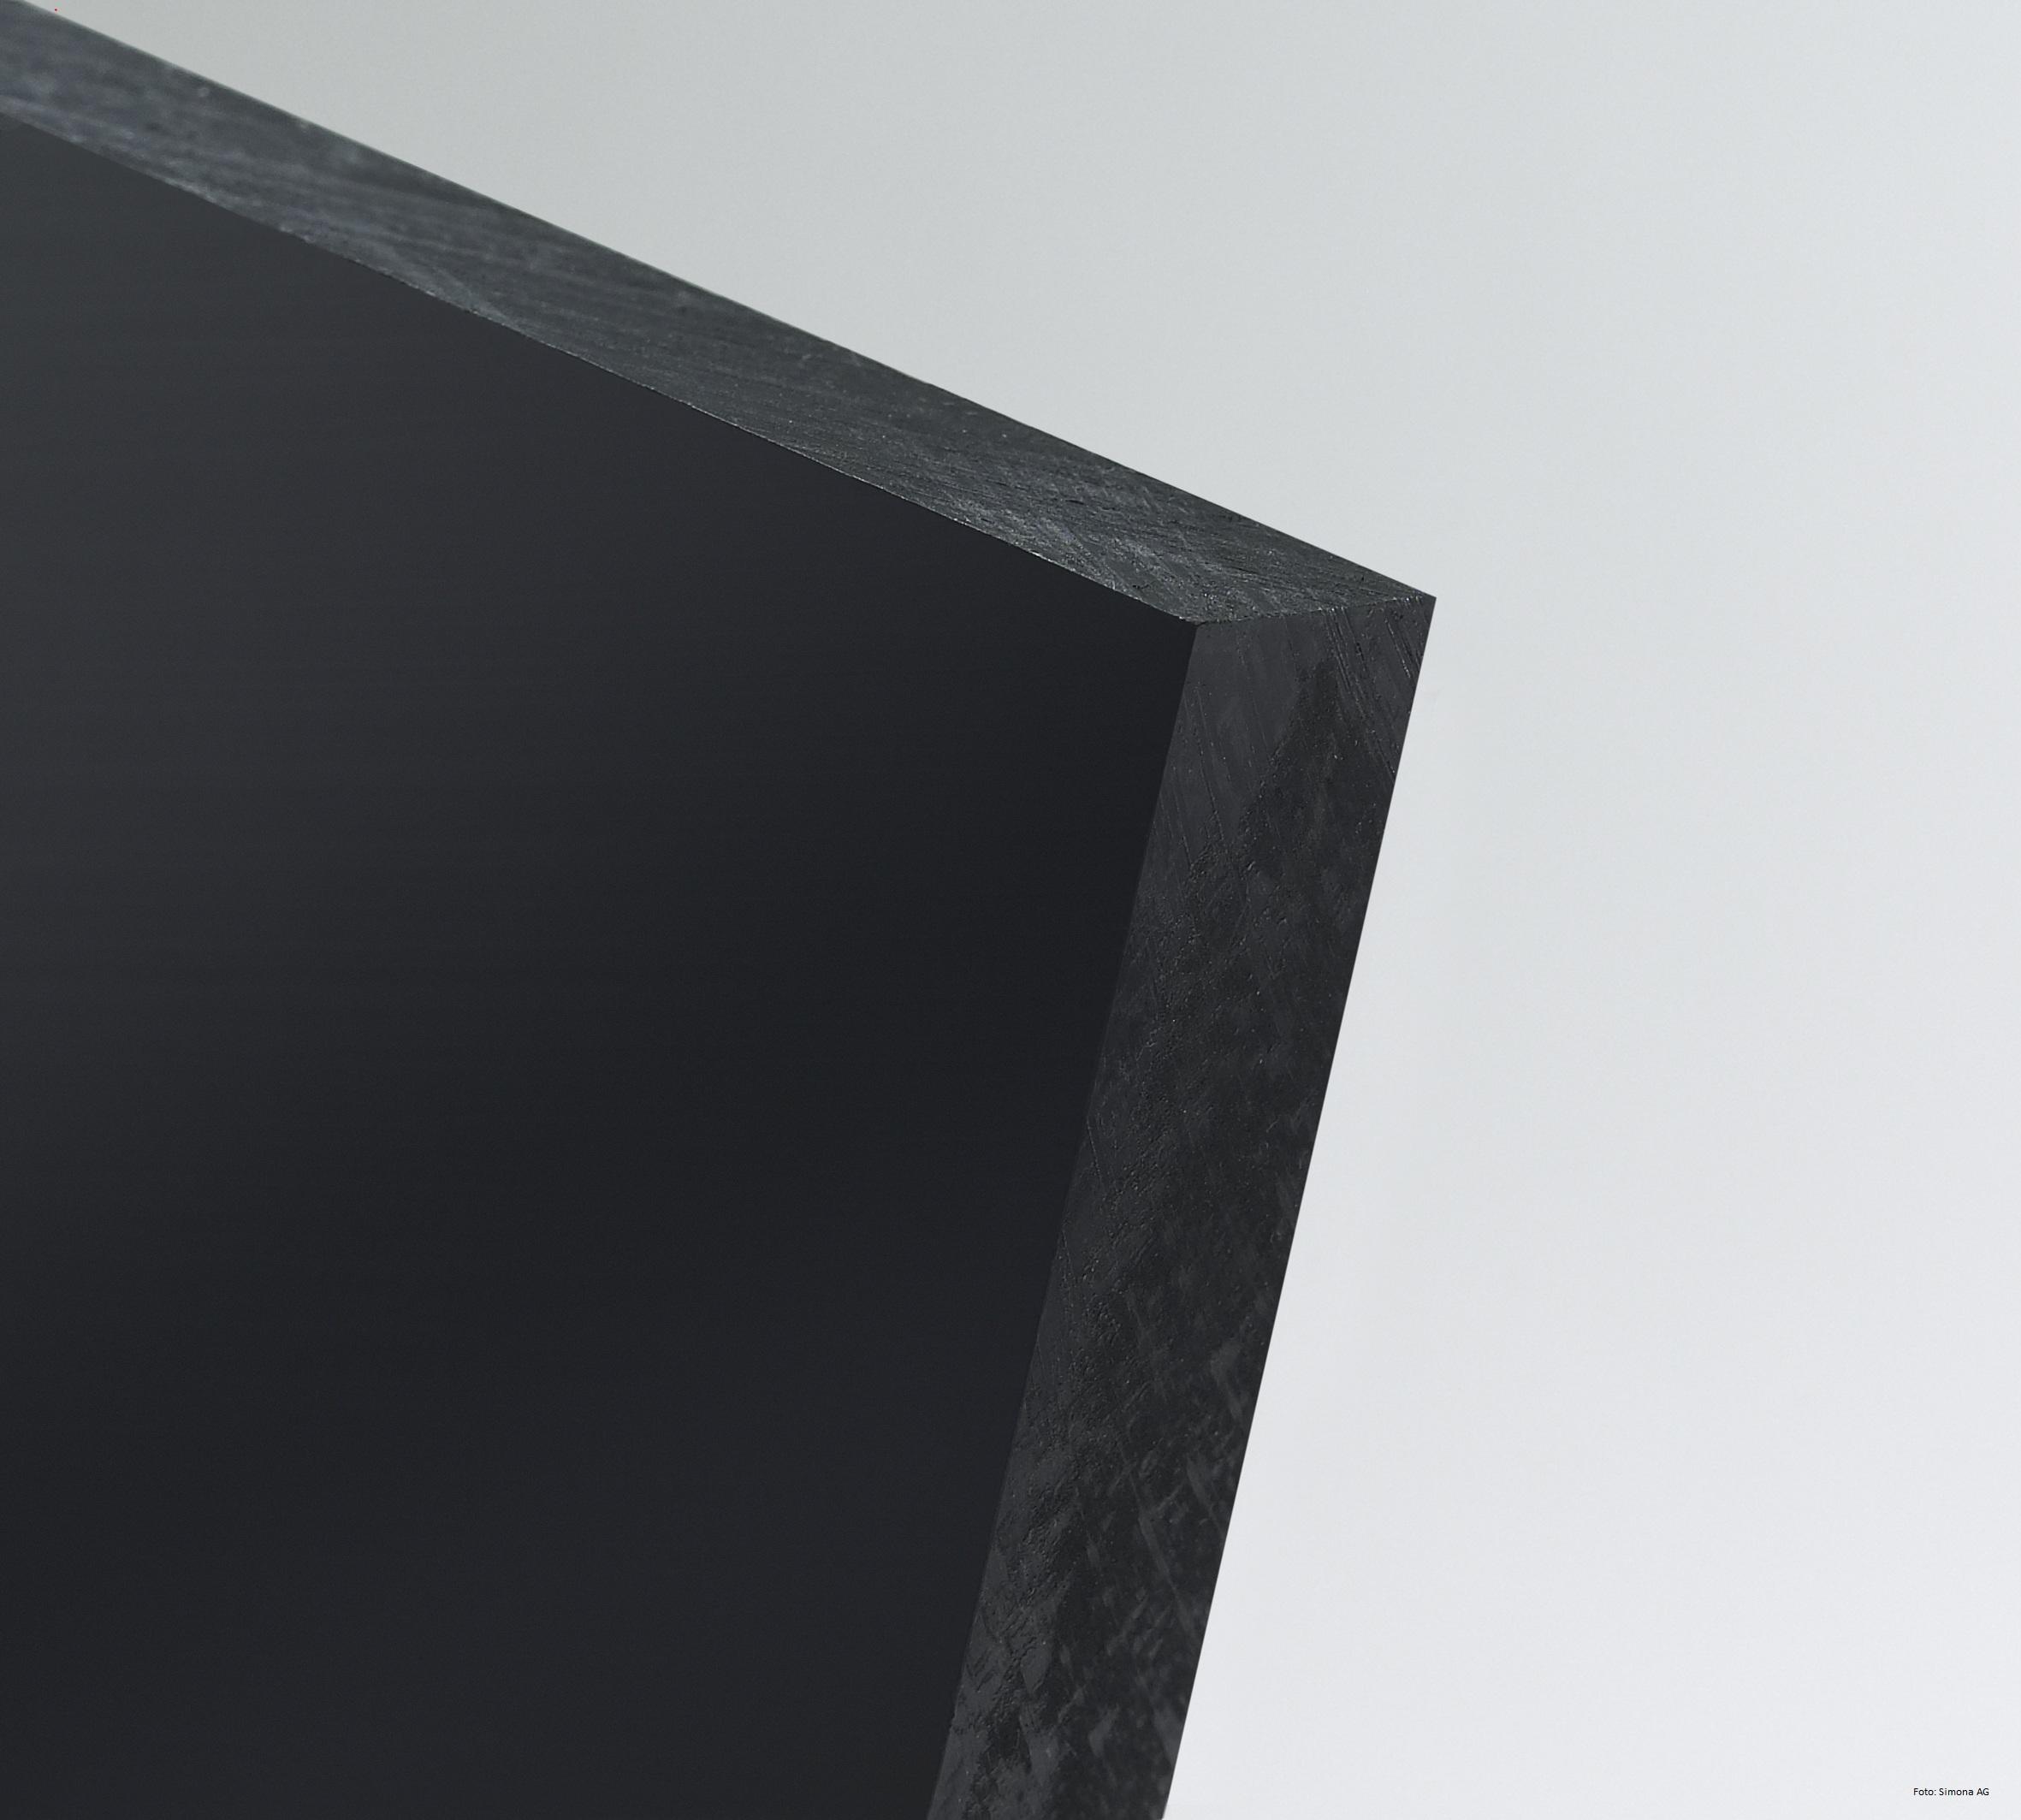 pe 1000 tafel schwarz antistatisch kleinformat. Black Bedroom Furniture Sets. Home Design Ideas